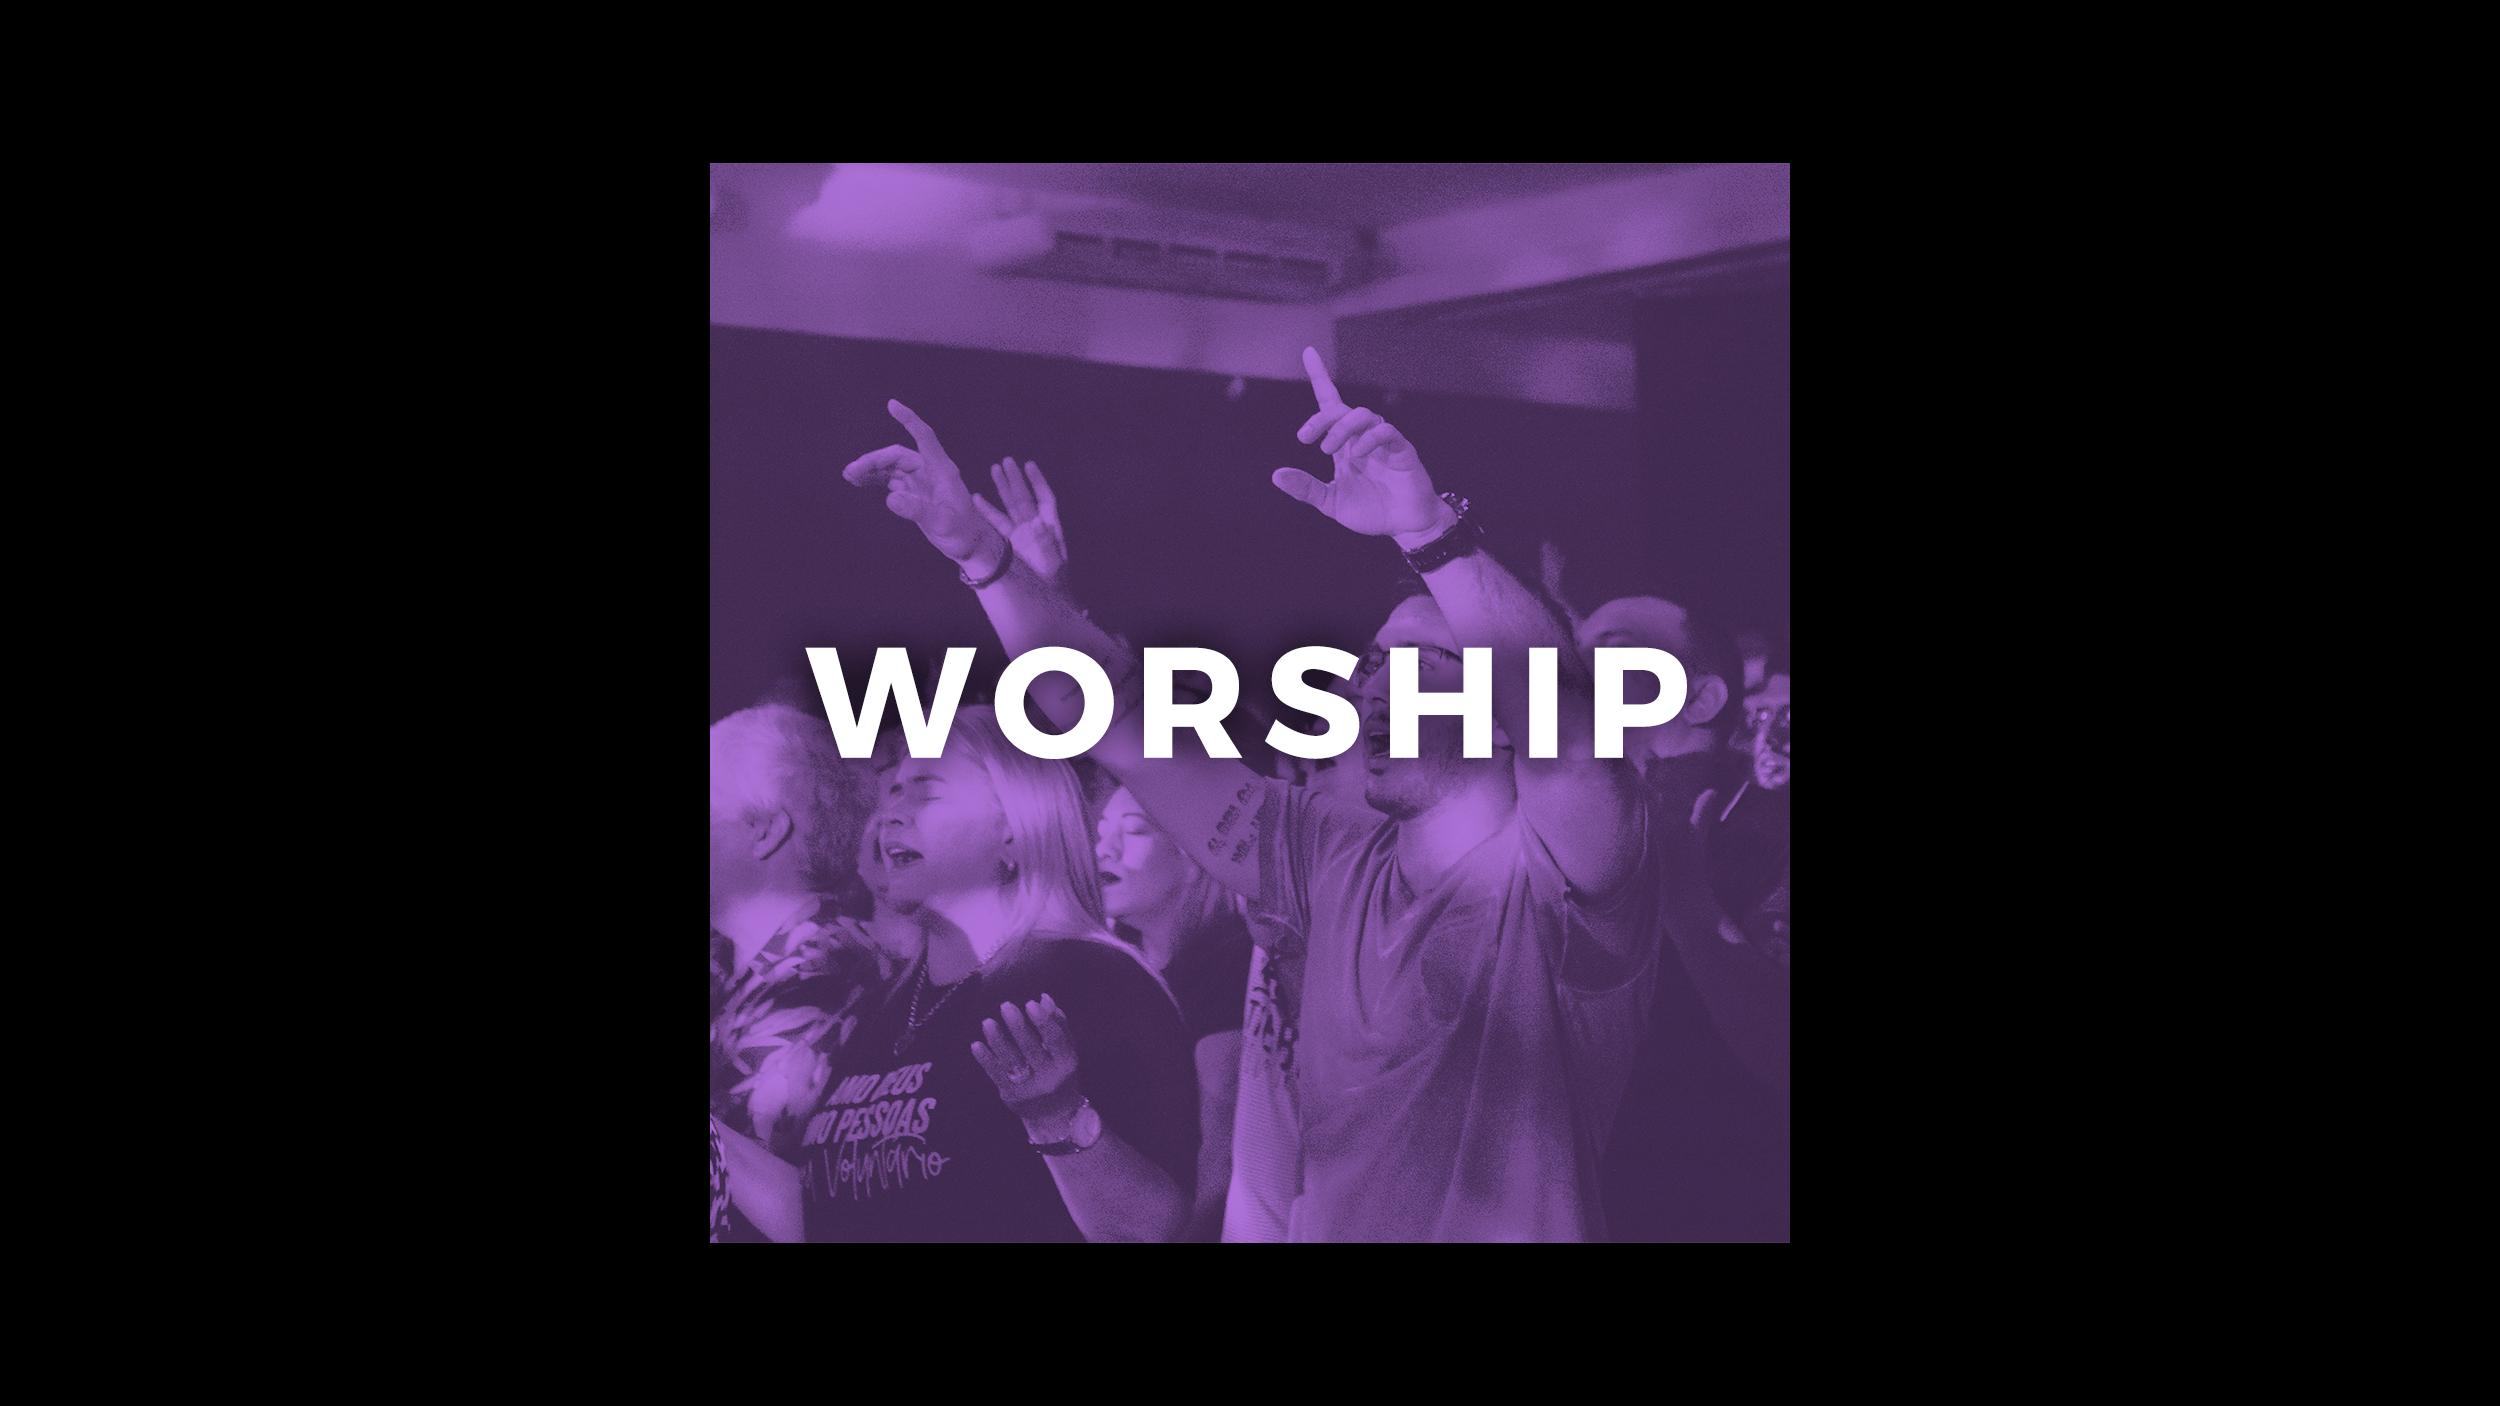 Five Purposes - Worship - 16-9.png